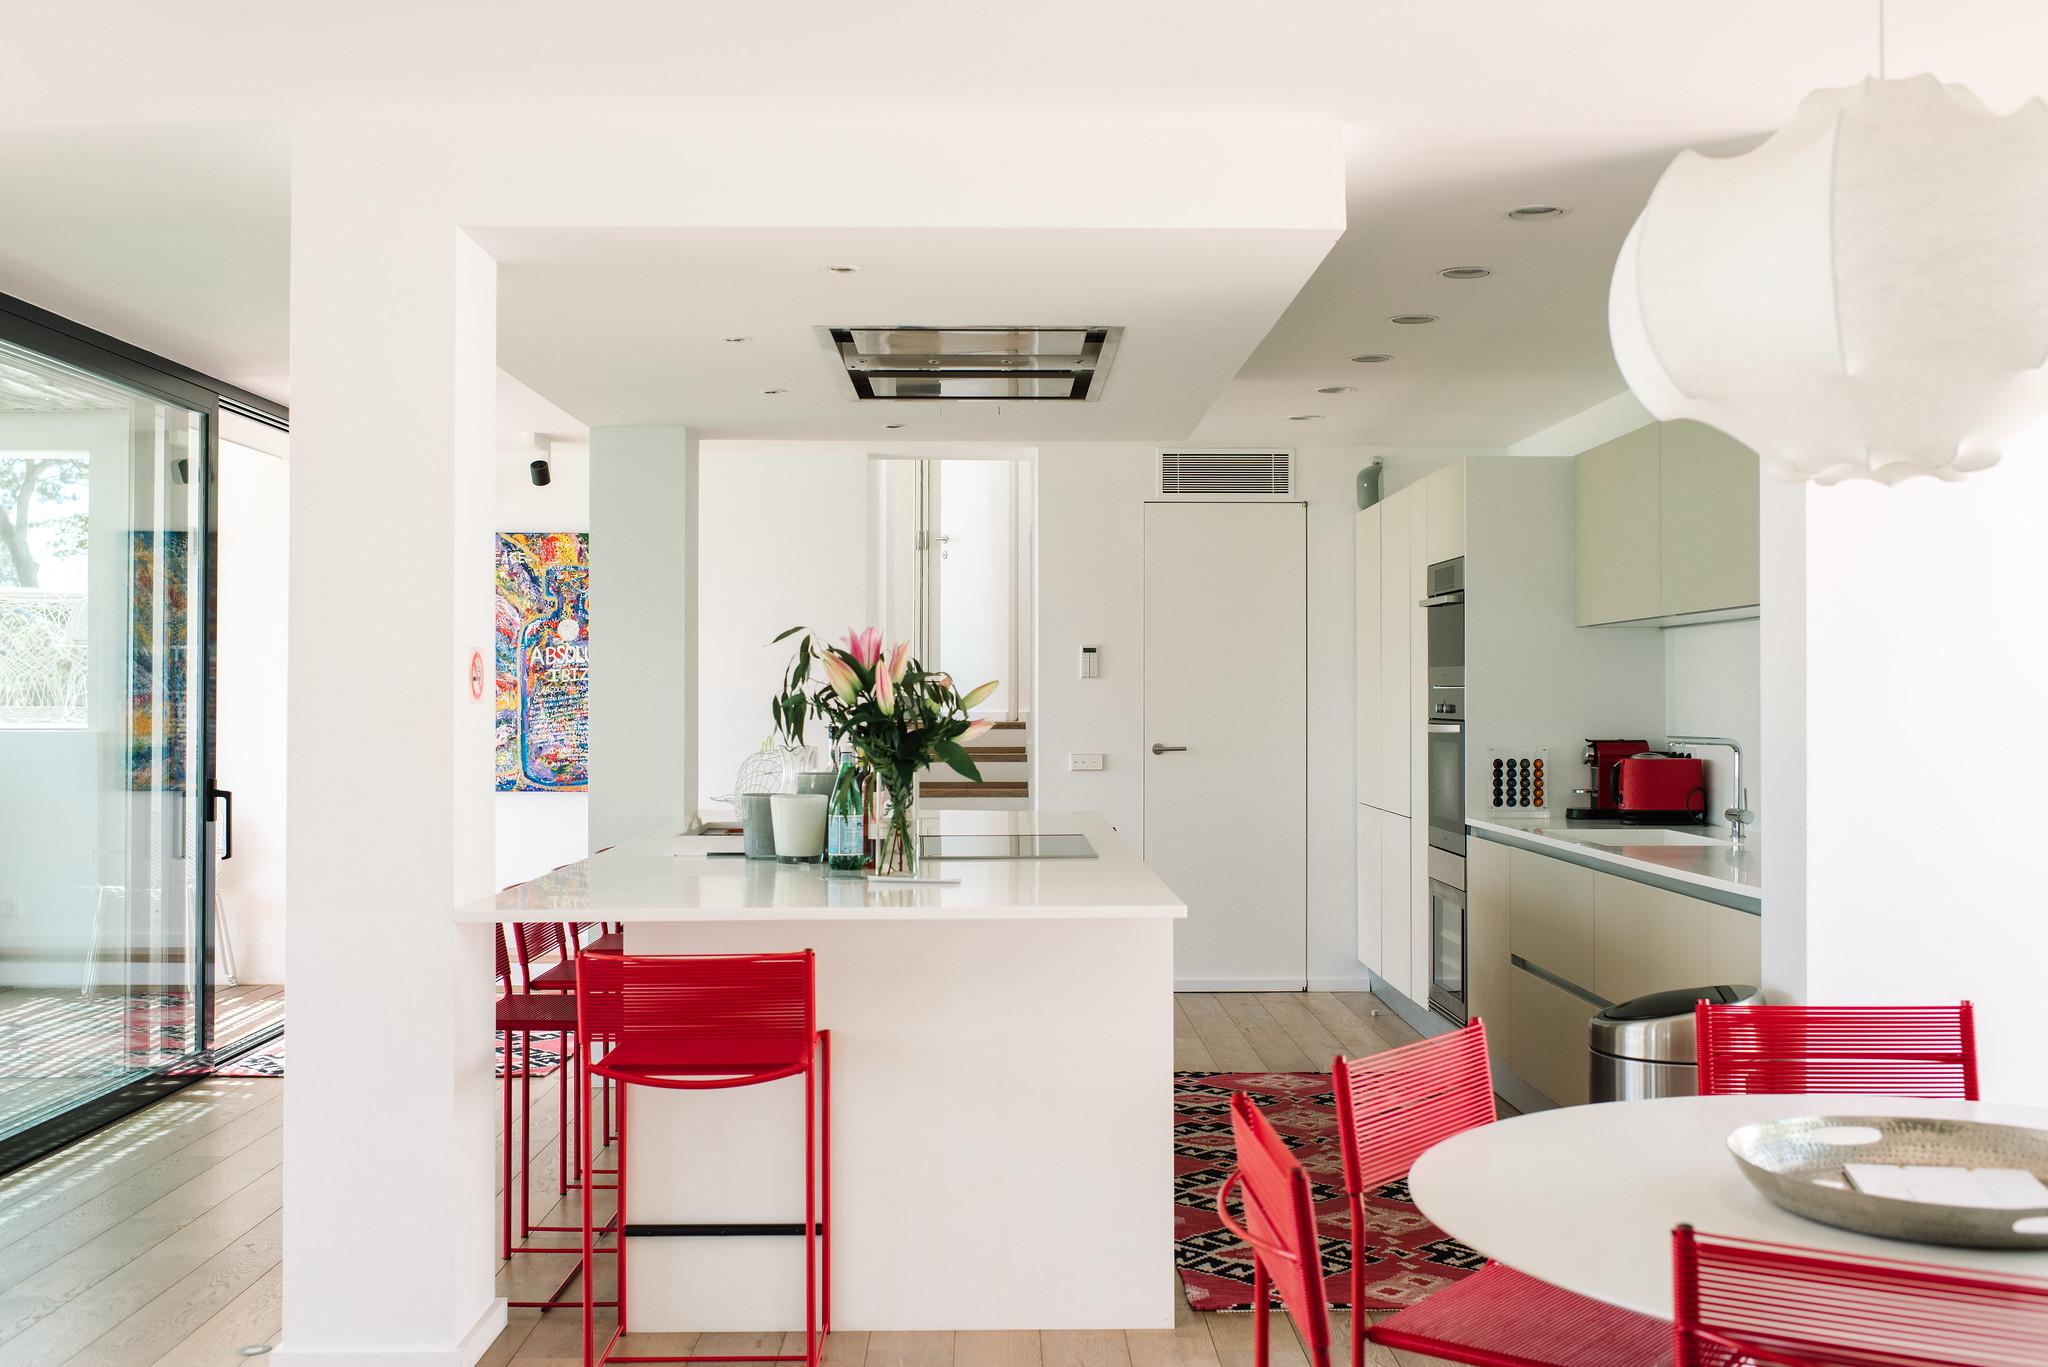 https://www.white-ibiza.com/wp-content/uploads/2020/06/white-ibiza-villas-can-jondal-interior-kitchen-1.jpg